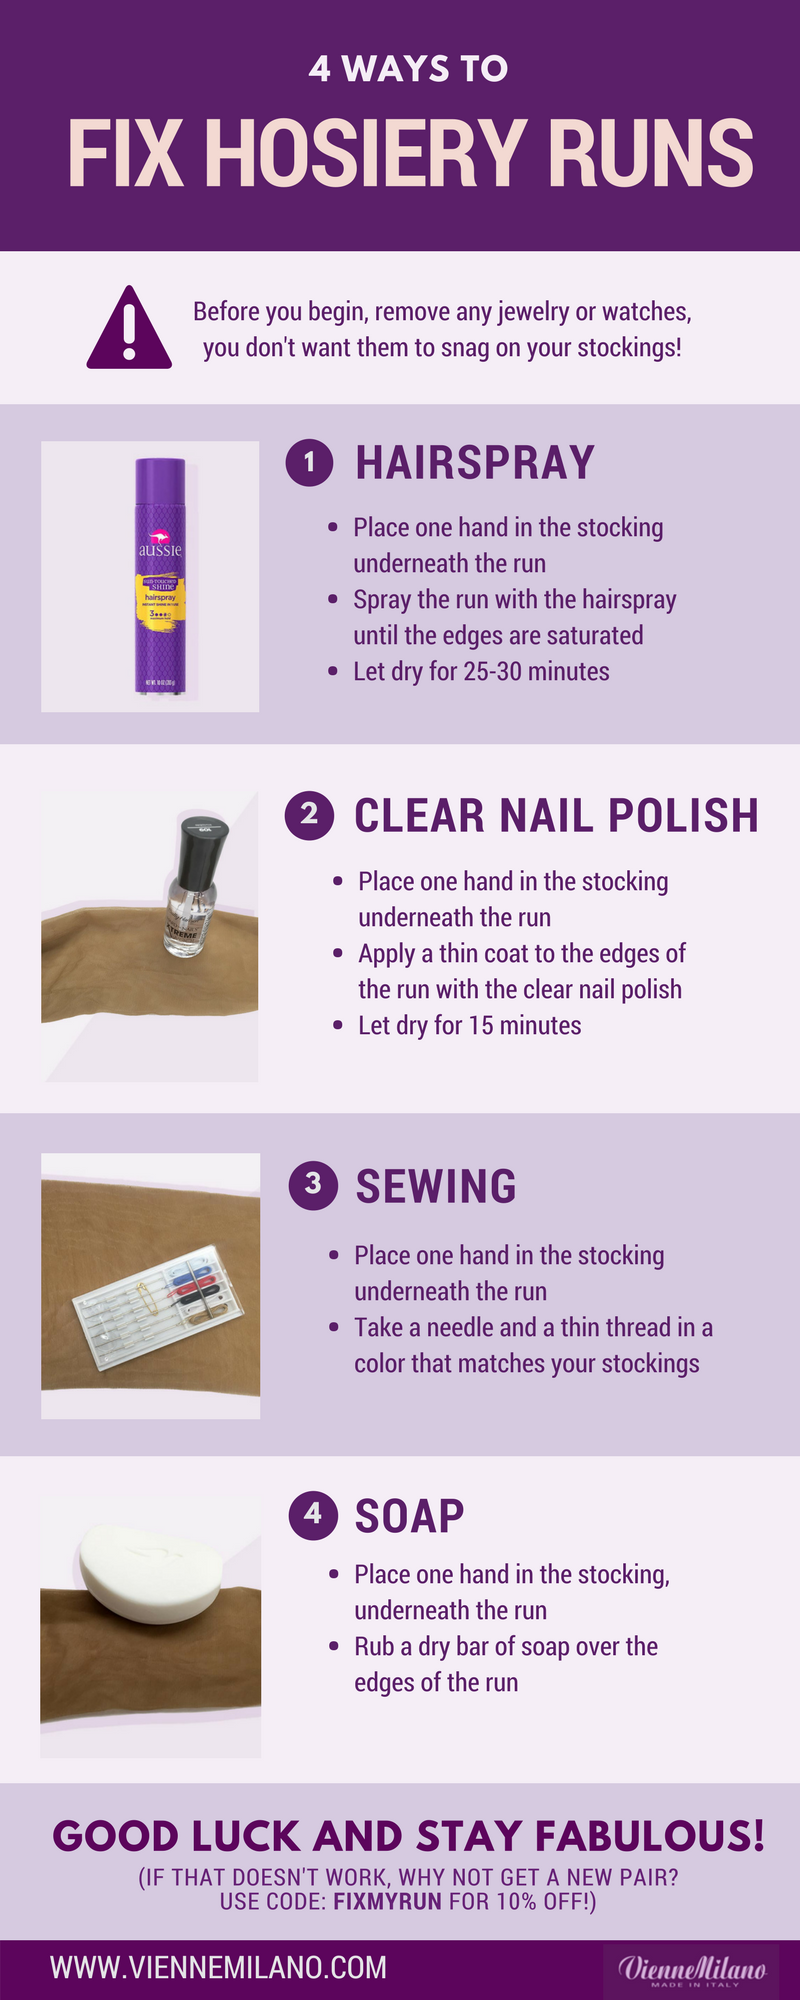 How to Fix Hosiery Runs